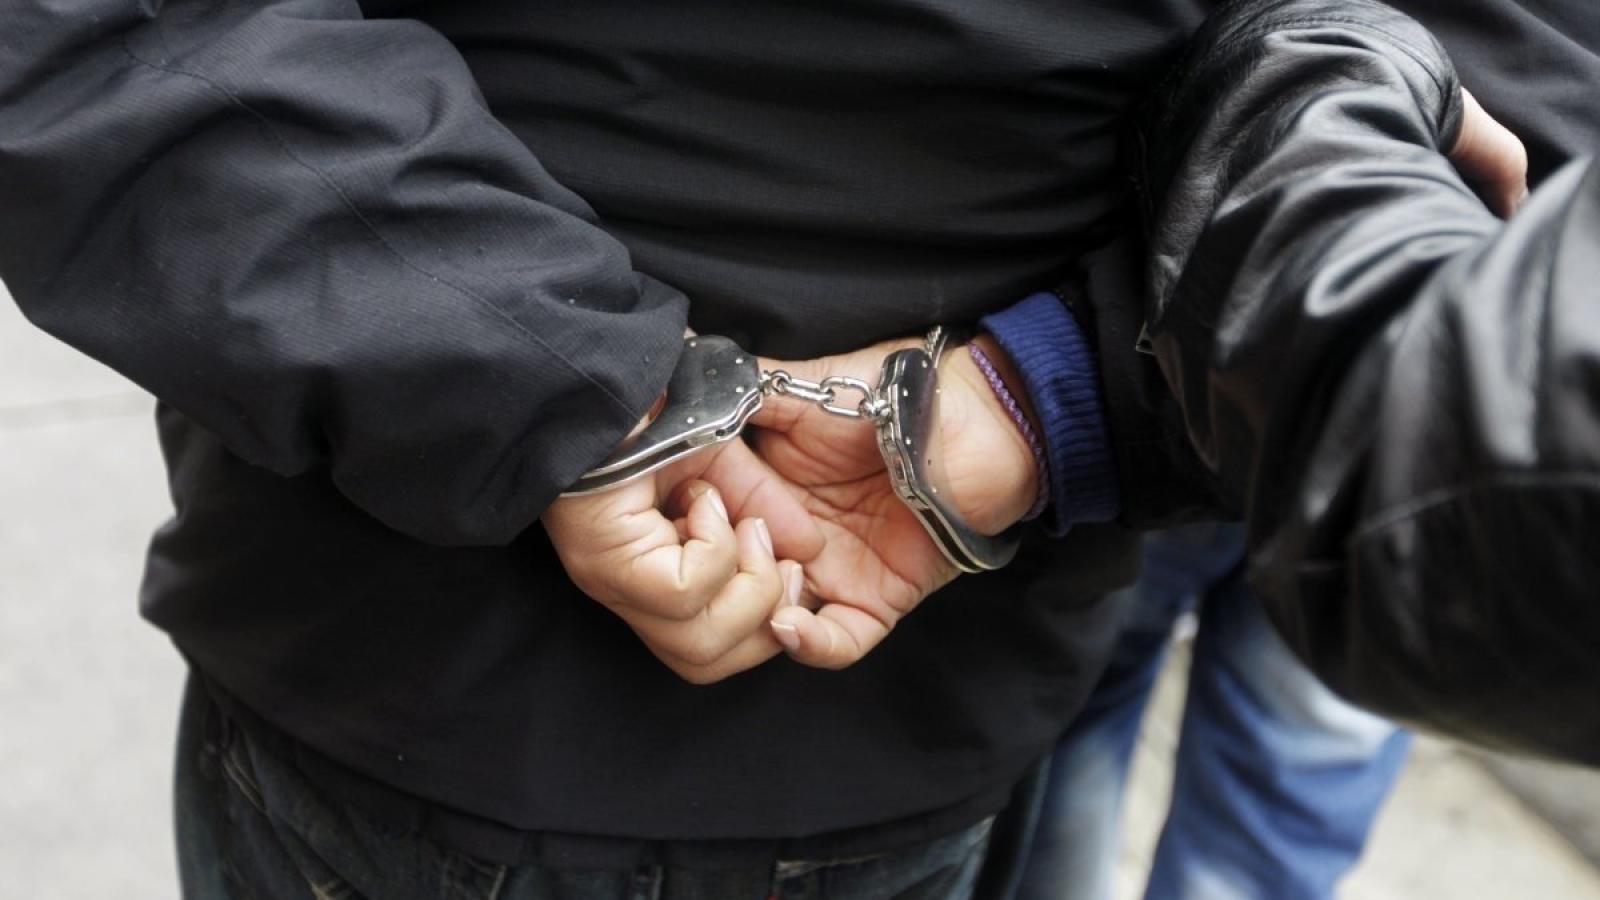 Череповчанин захватил в заложники директора предприятия и избил его